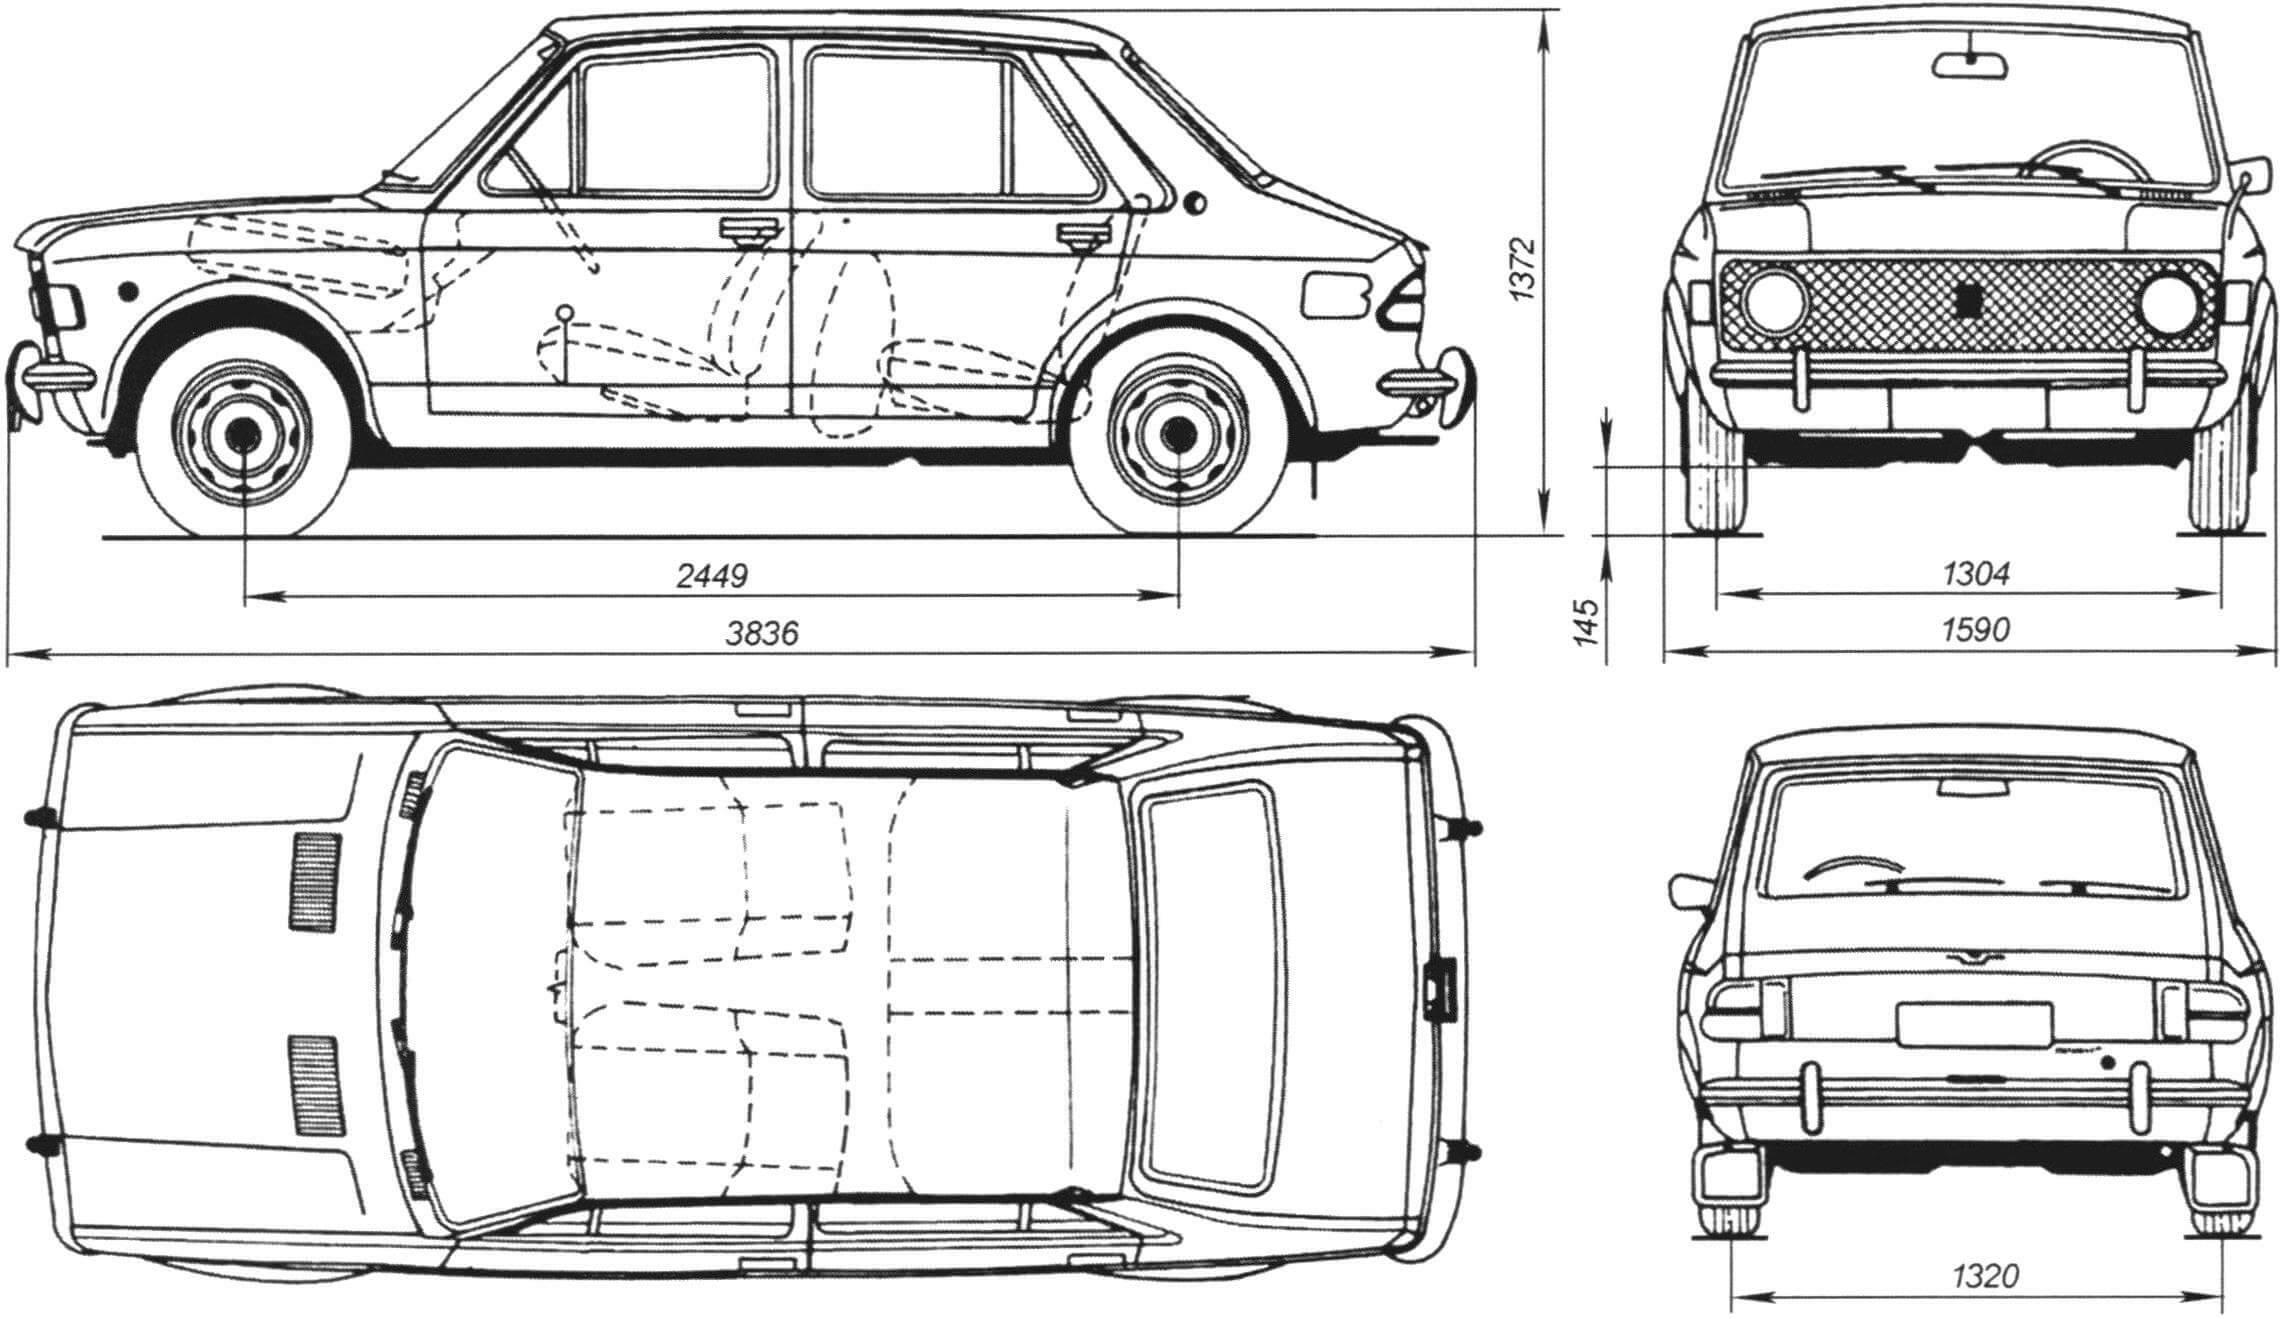 Габаритный чертеж автомобиля Zastava 101